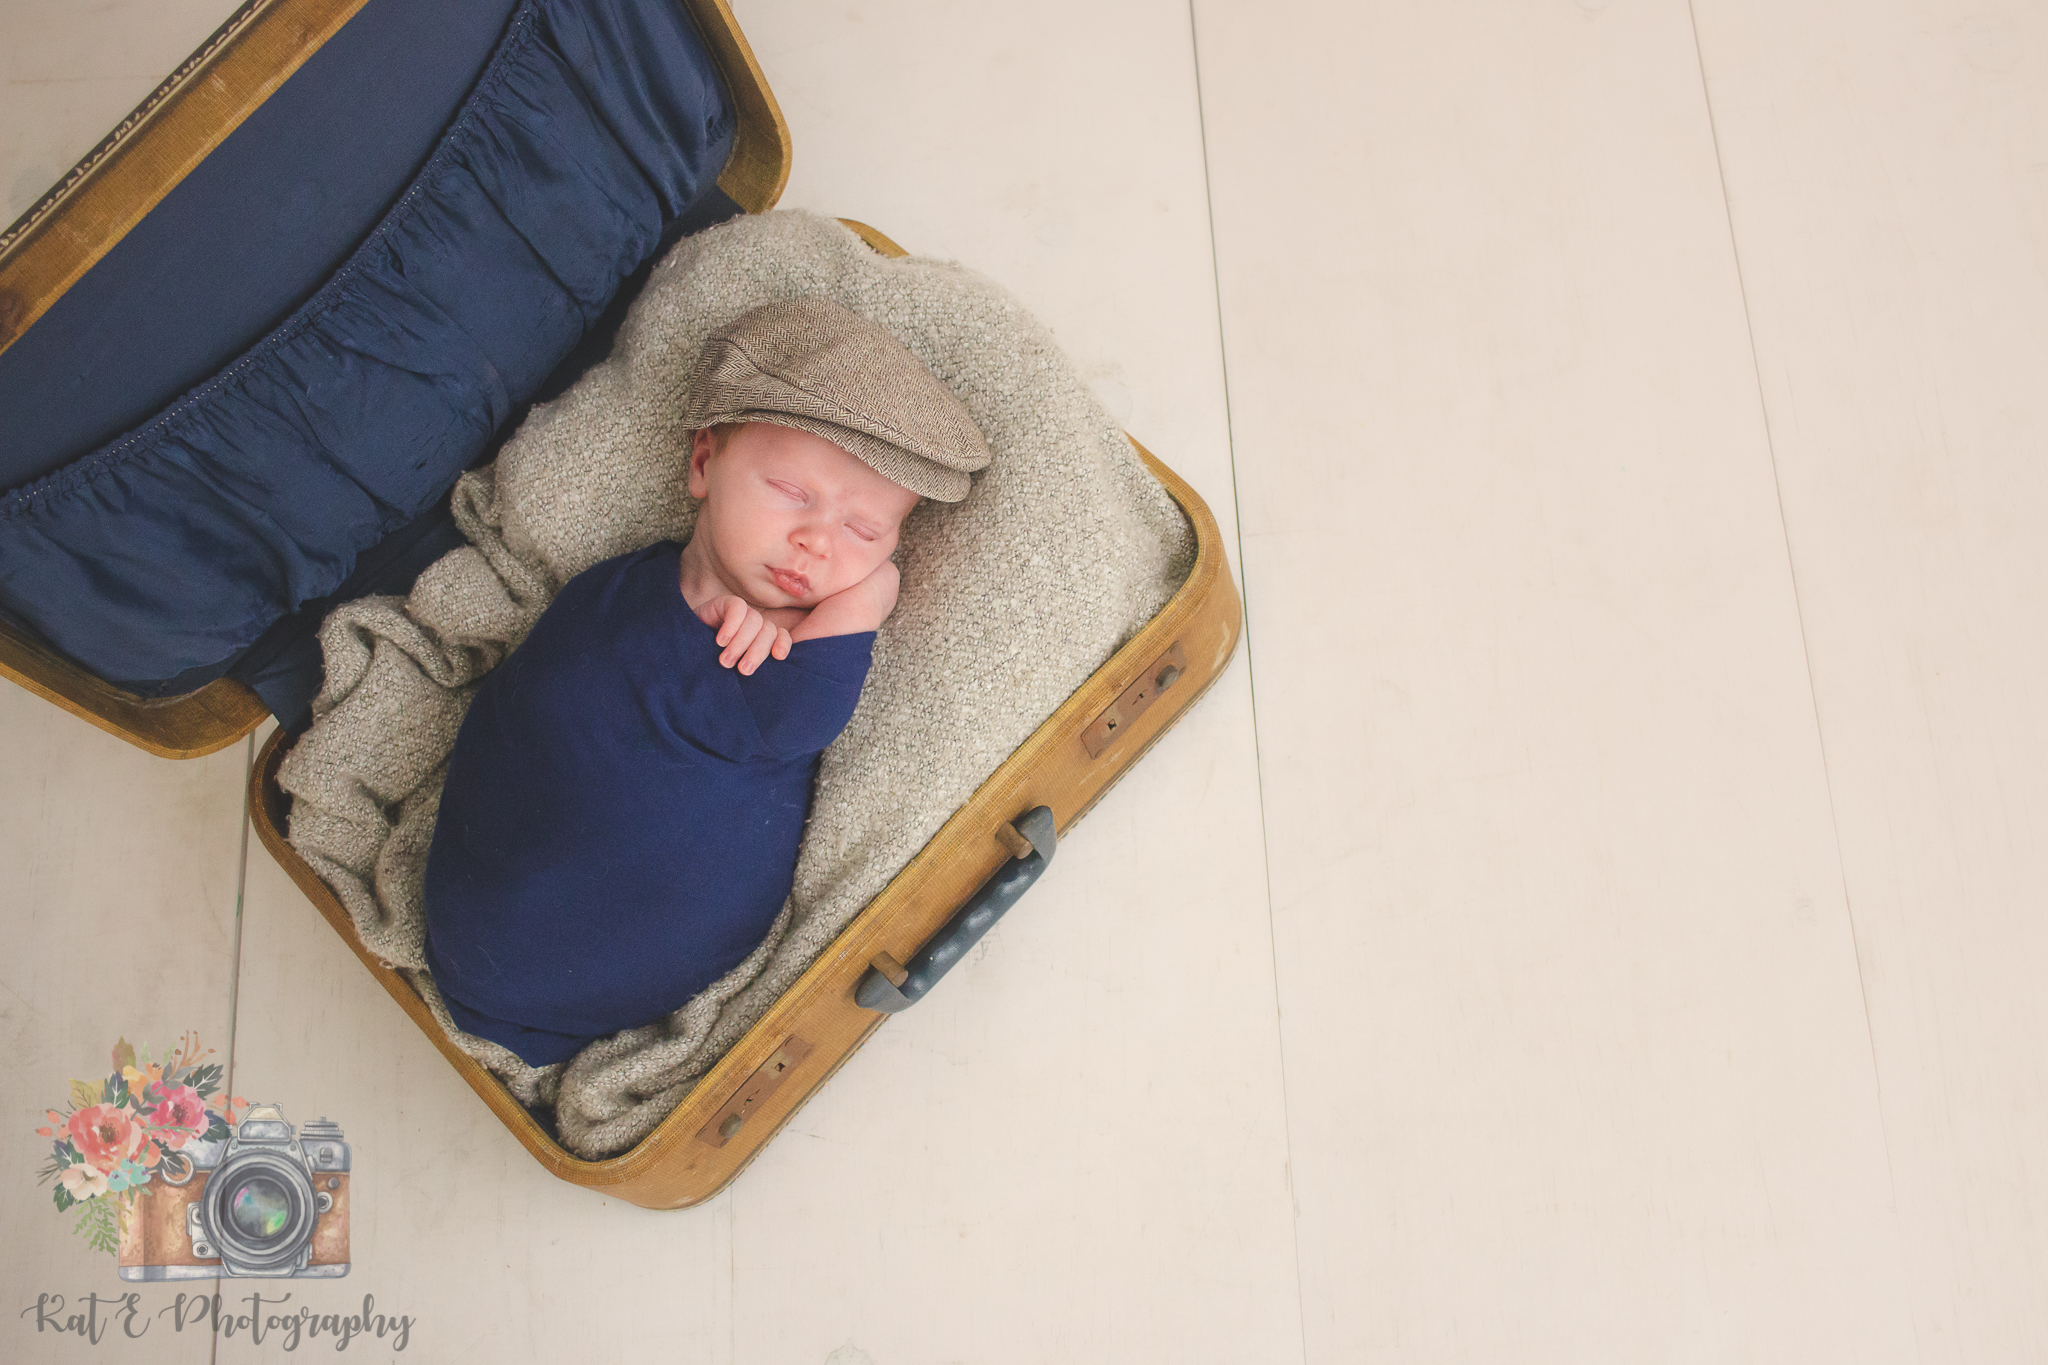 Mini Vintage Suitcase